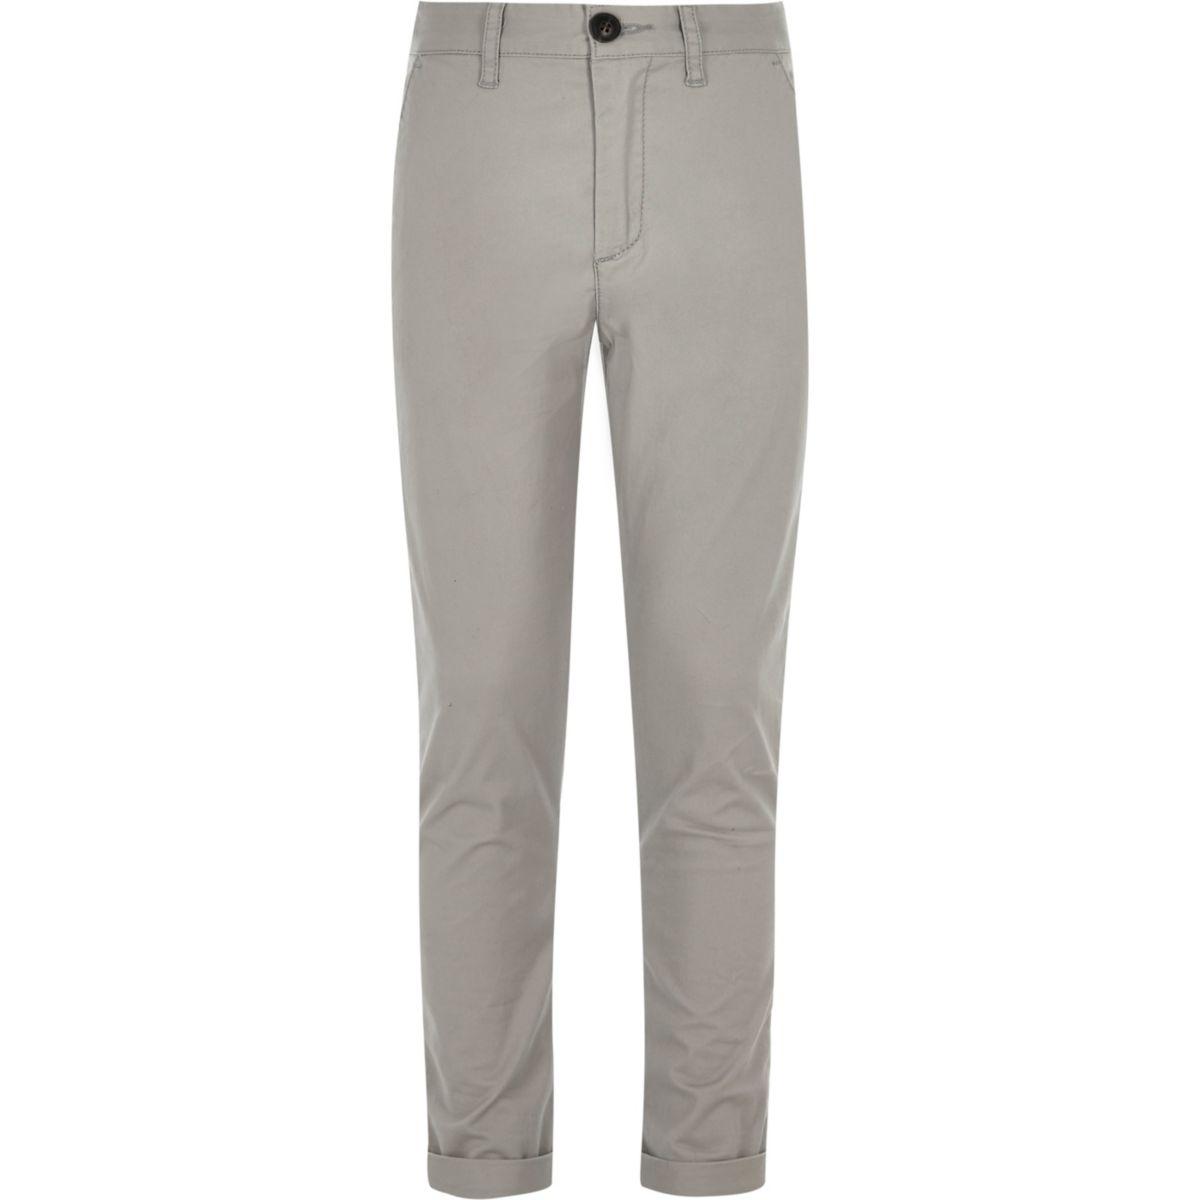 Boys grey Sid skinny fit chino pants